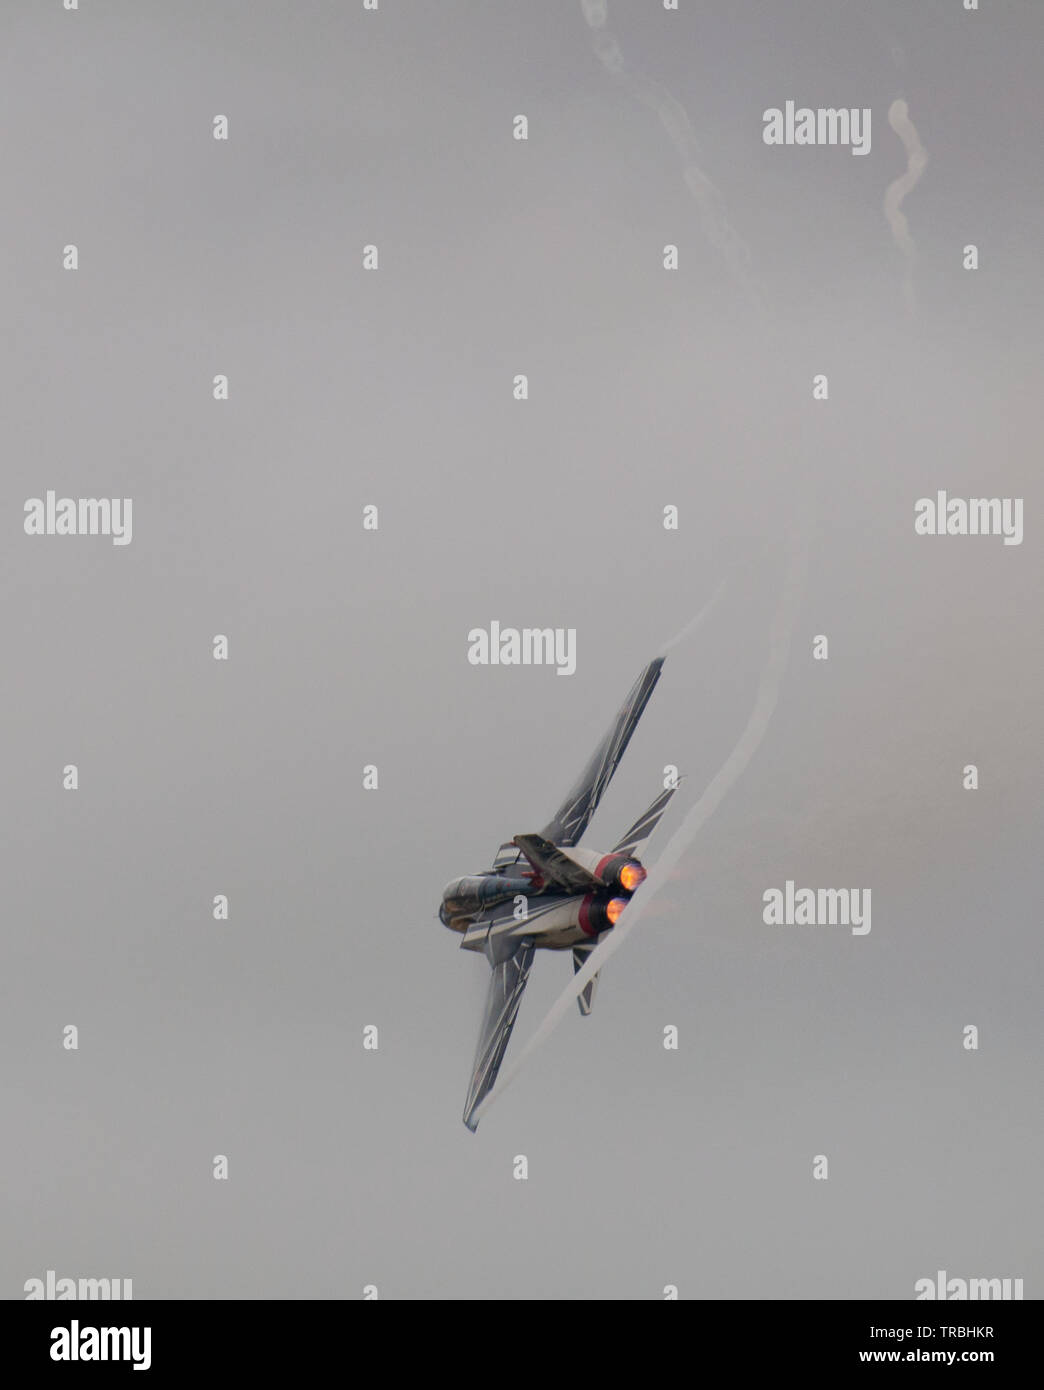 Spanish Air Force EF-18A Hornet Stock Photo